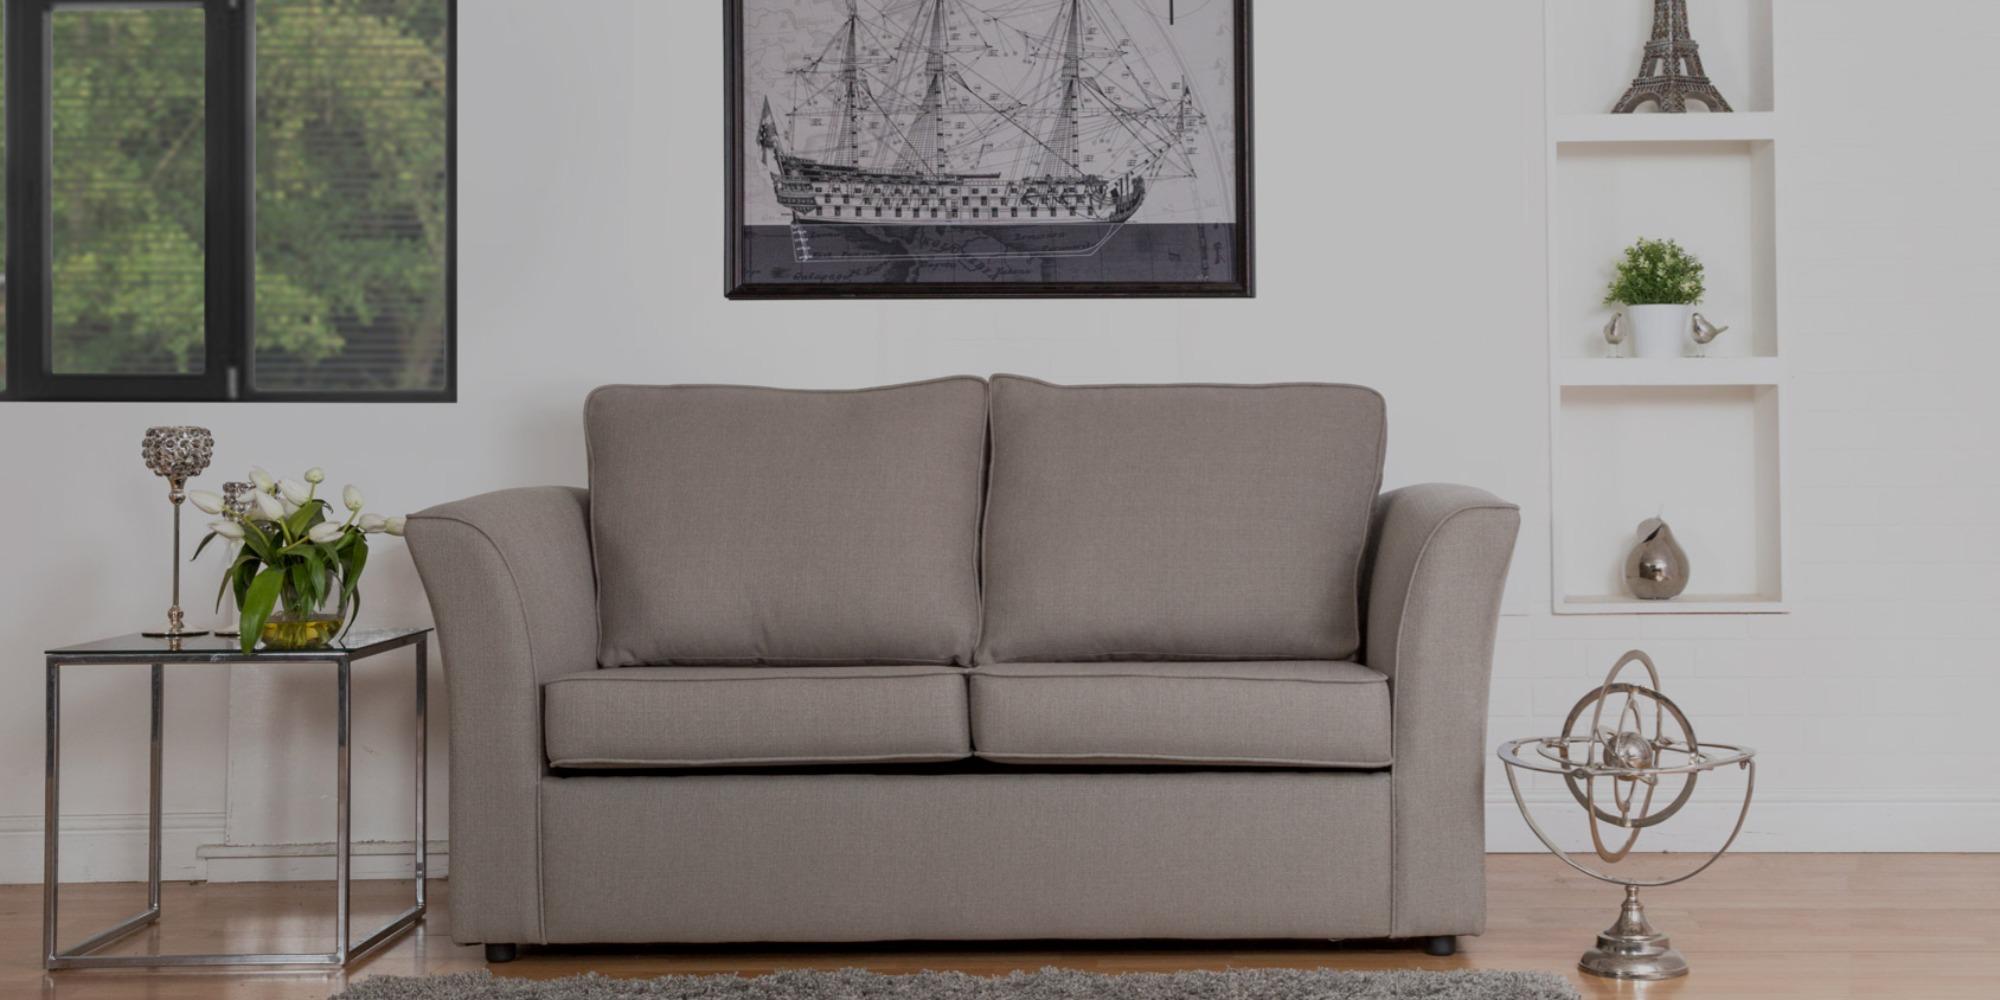 Buoyant Upholstery - NEXUS